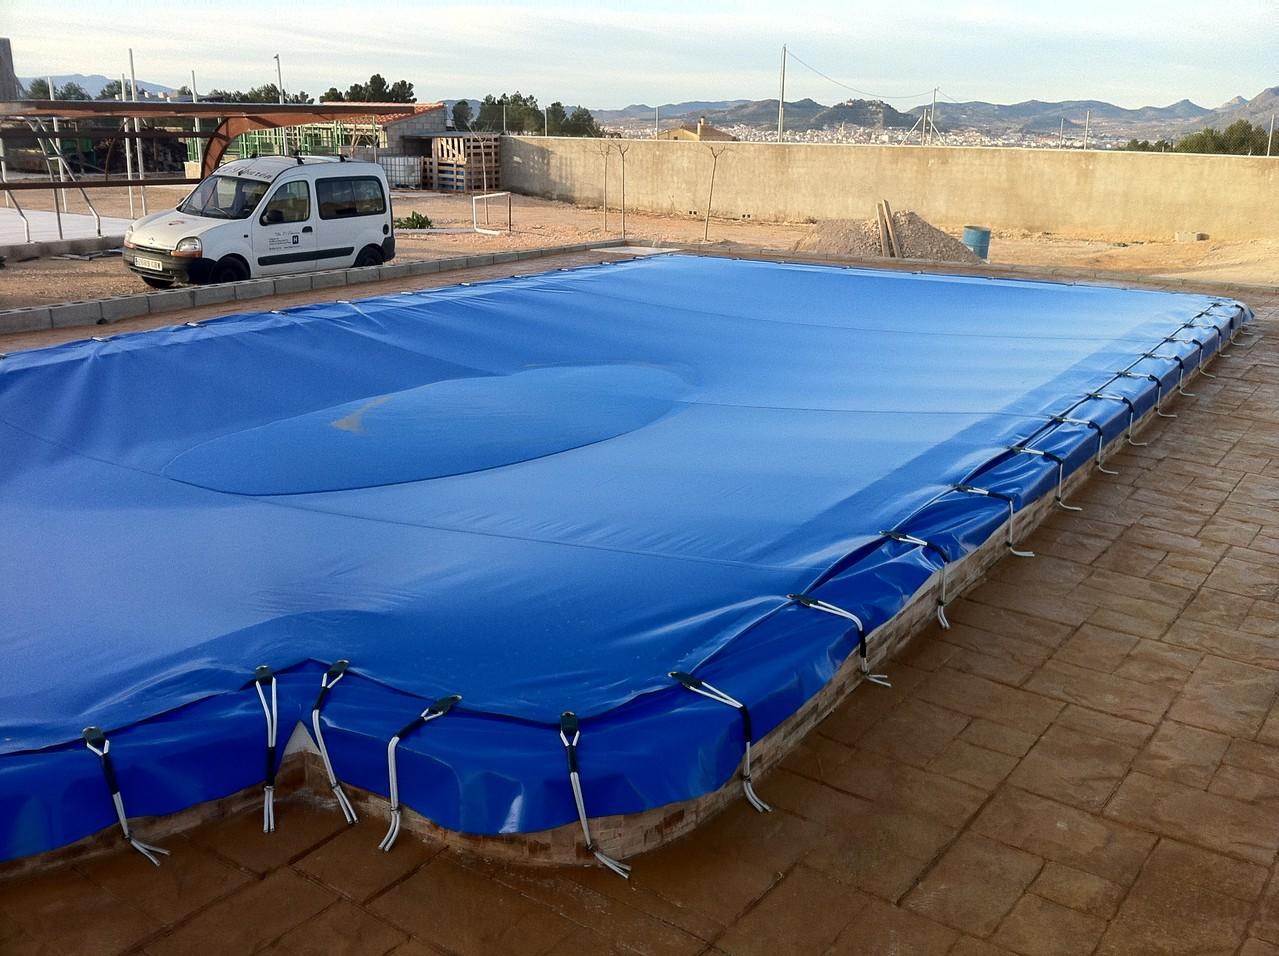 Cubiertas autom ticas para piscinas alicante piscinas rachid - Piscina cubierta alicante ...